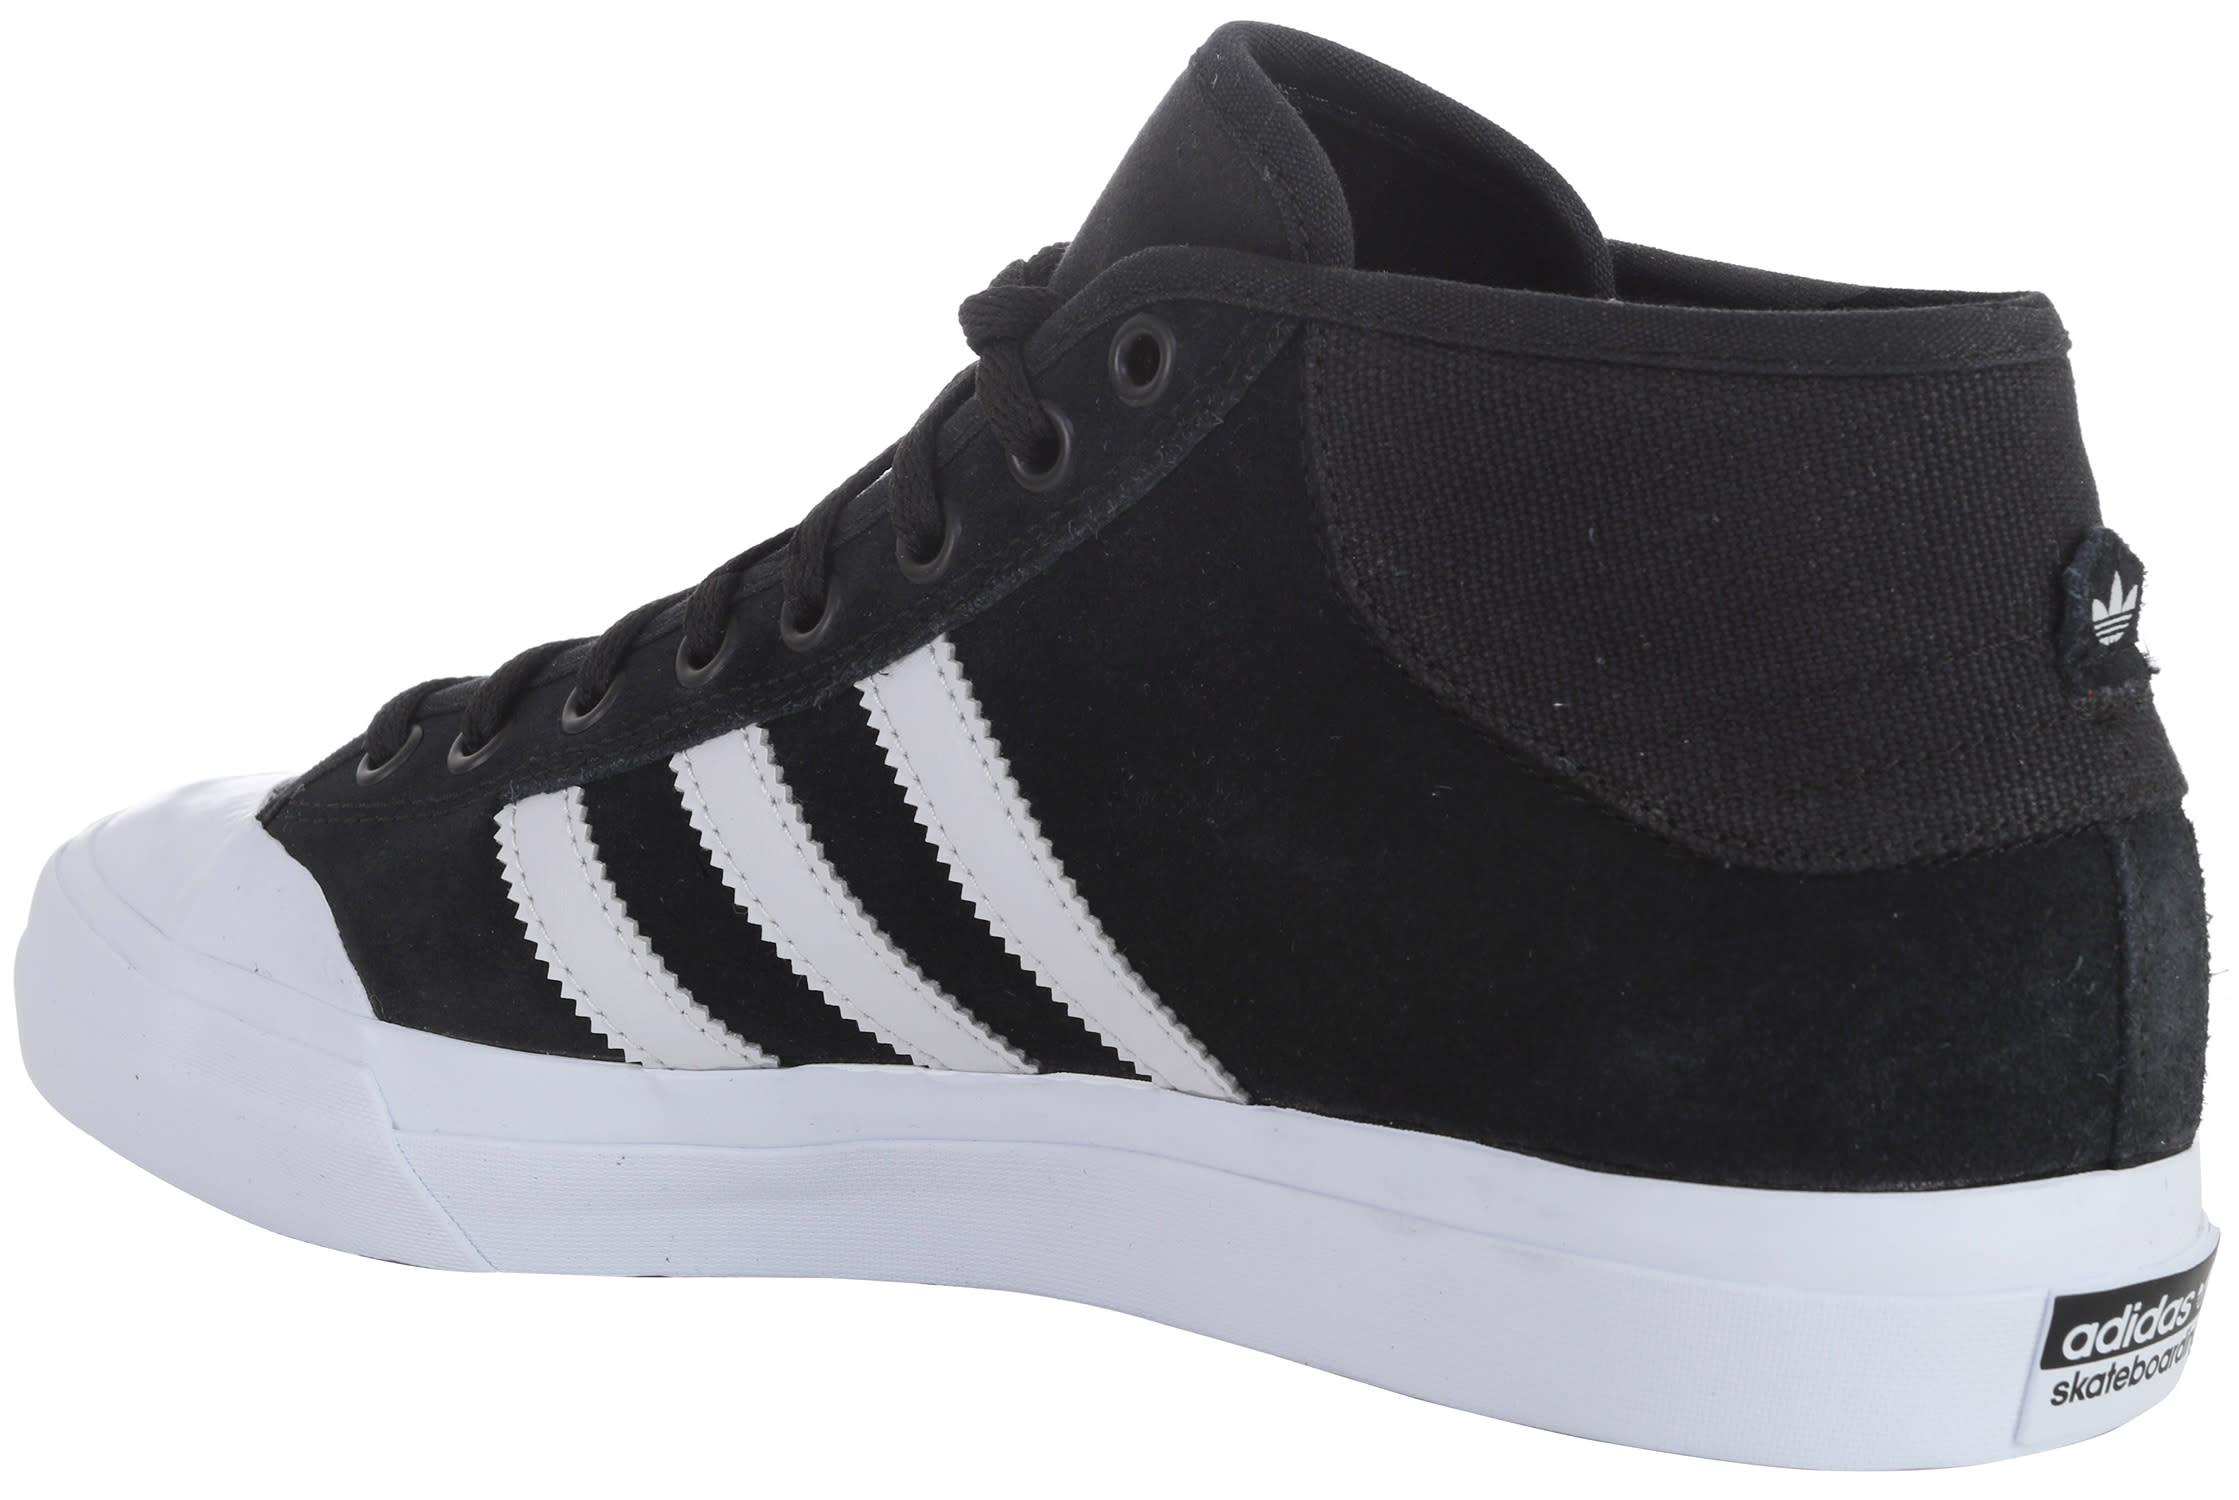 huge discount afc8d 111cd Adidas Matchcourt Mid ADV Skate Shoes - thumbnail 3